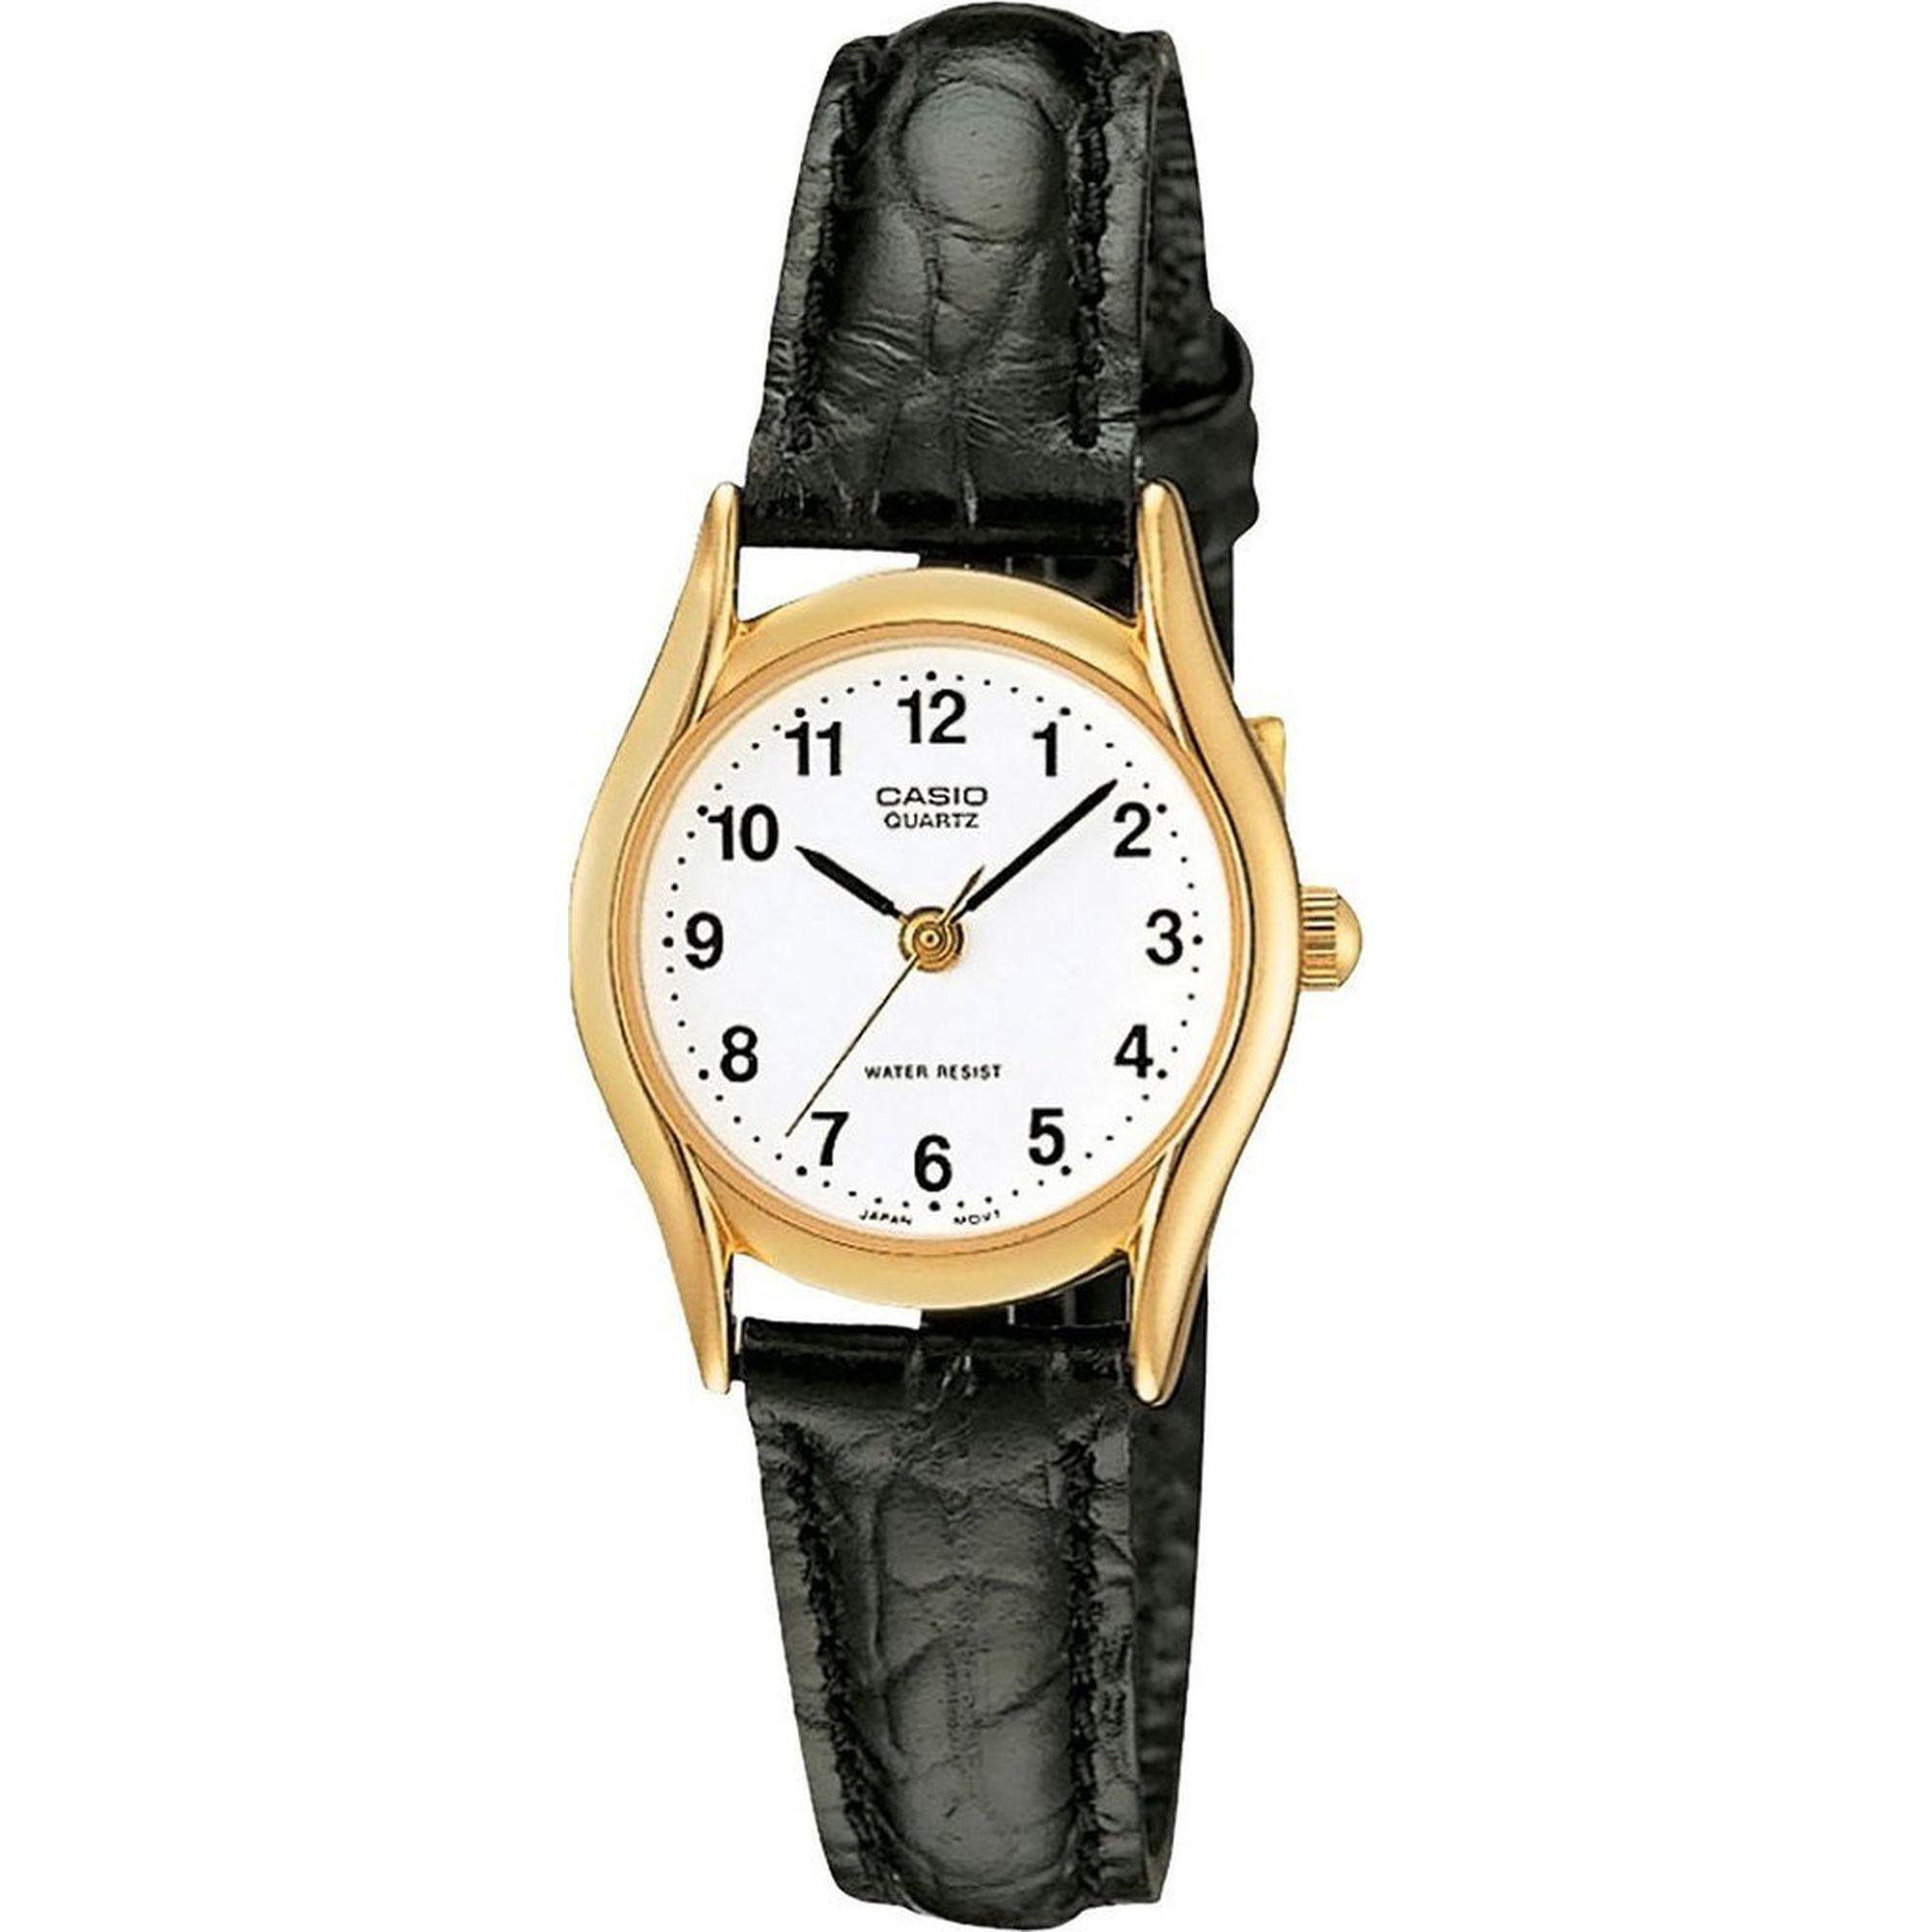 Casio Ρολόι με Μαύρο Δερμάτινο Λουράκι LTP-1154PQ-7BEF